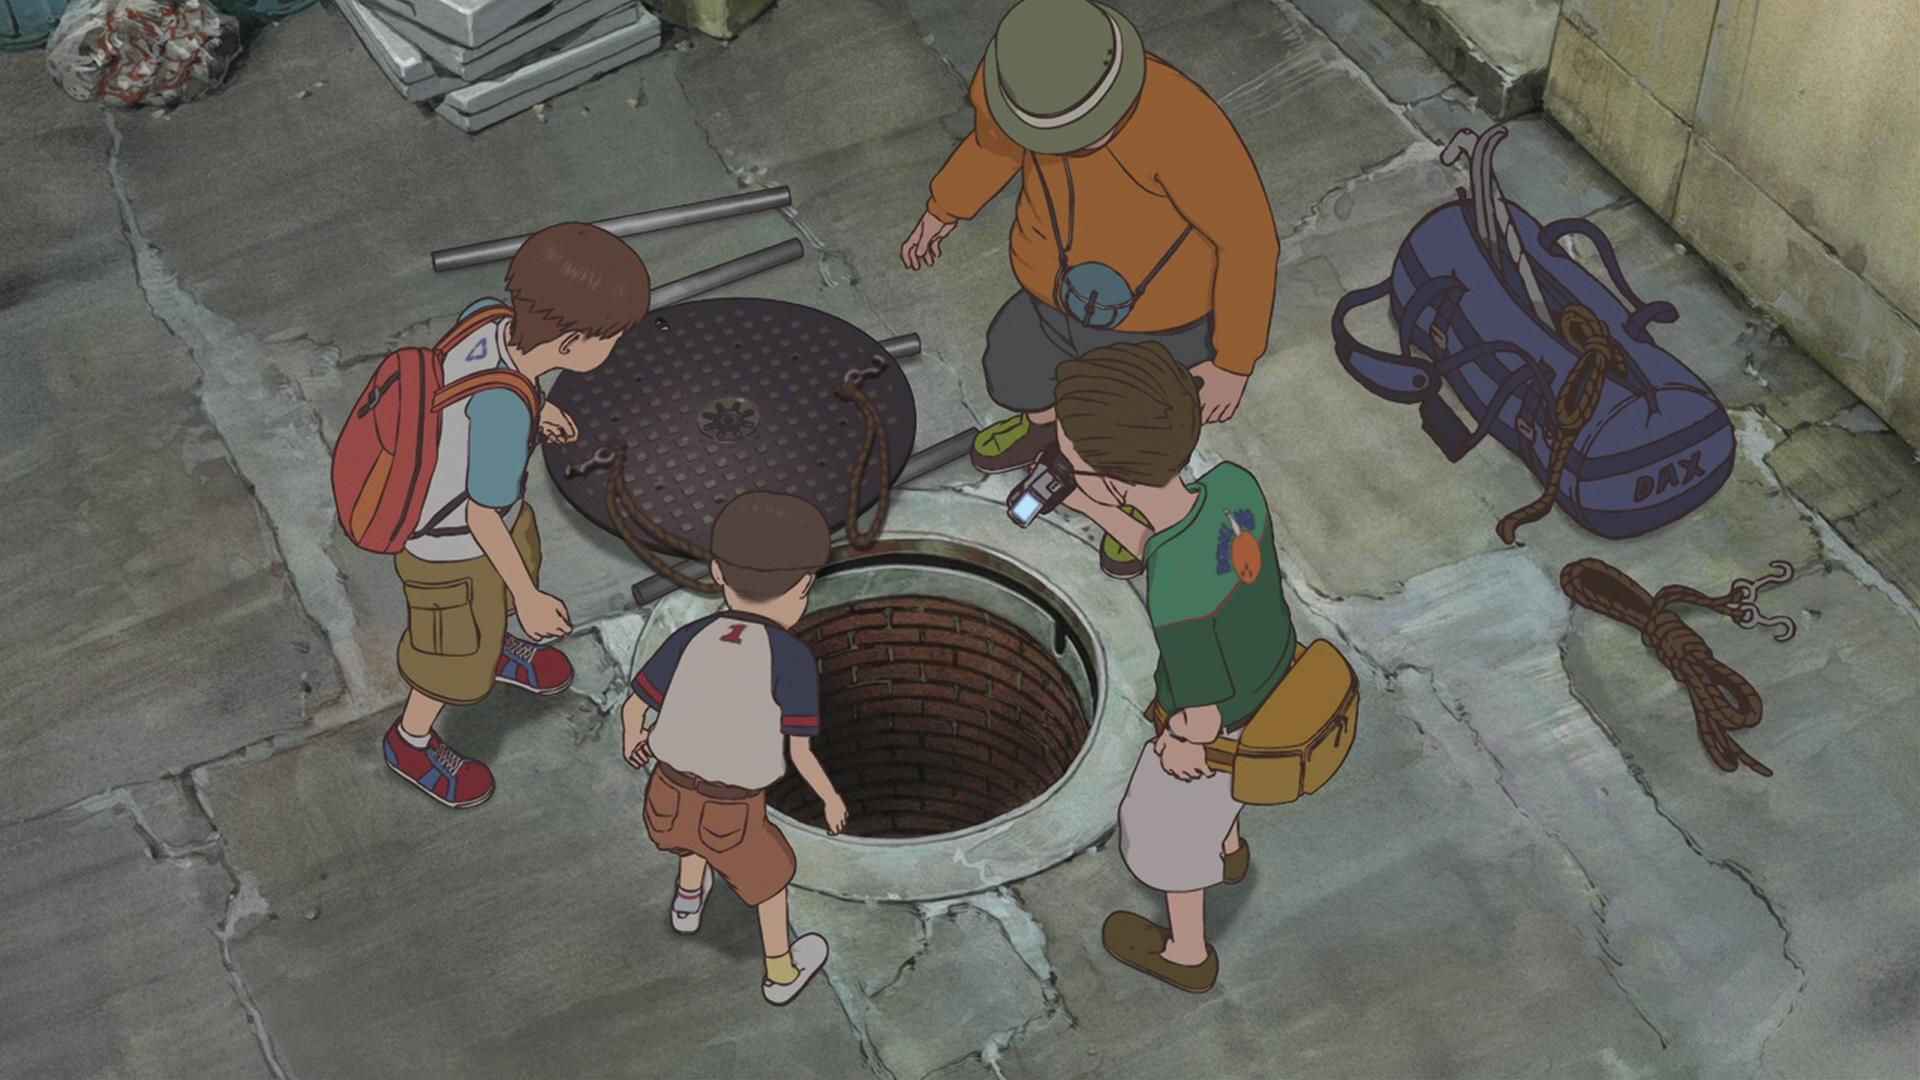 anime παιχνίδια γνωριμιών σε απευθείας σύνδεση περιστασιακή οδηγίες γνωριμιών